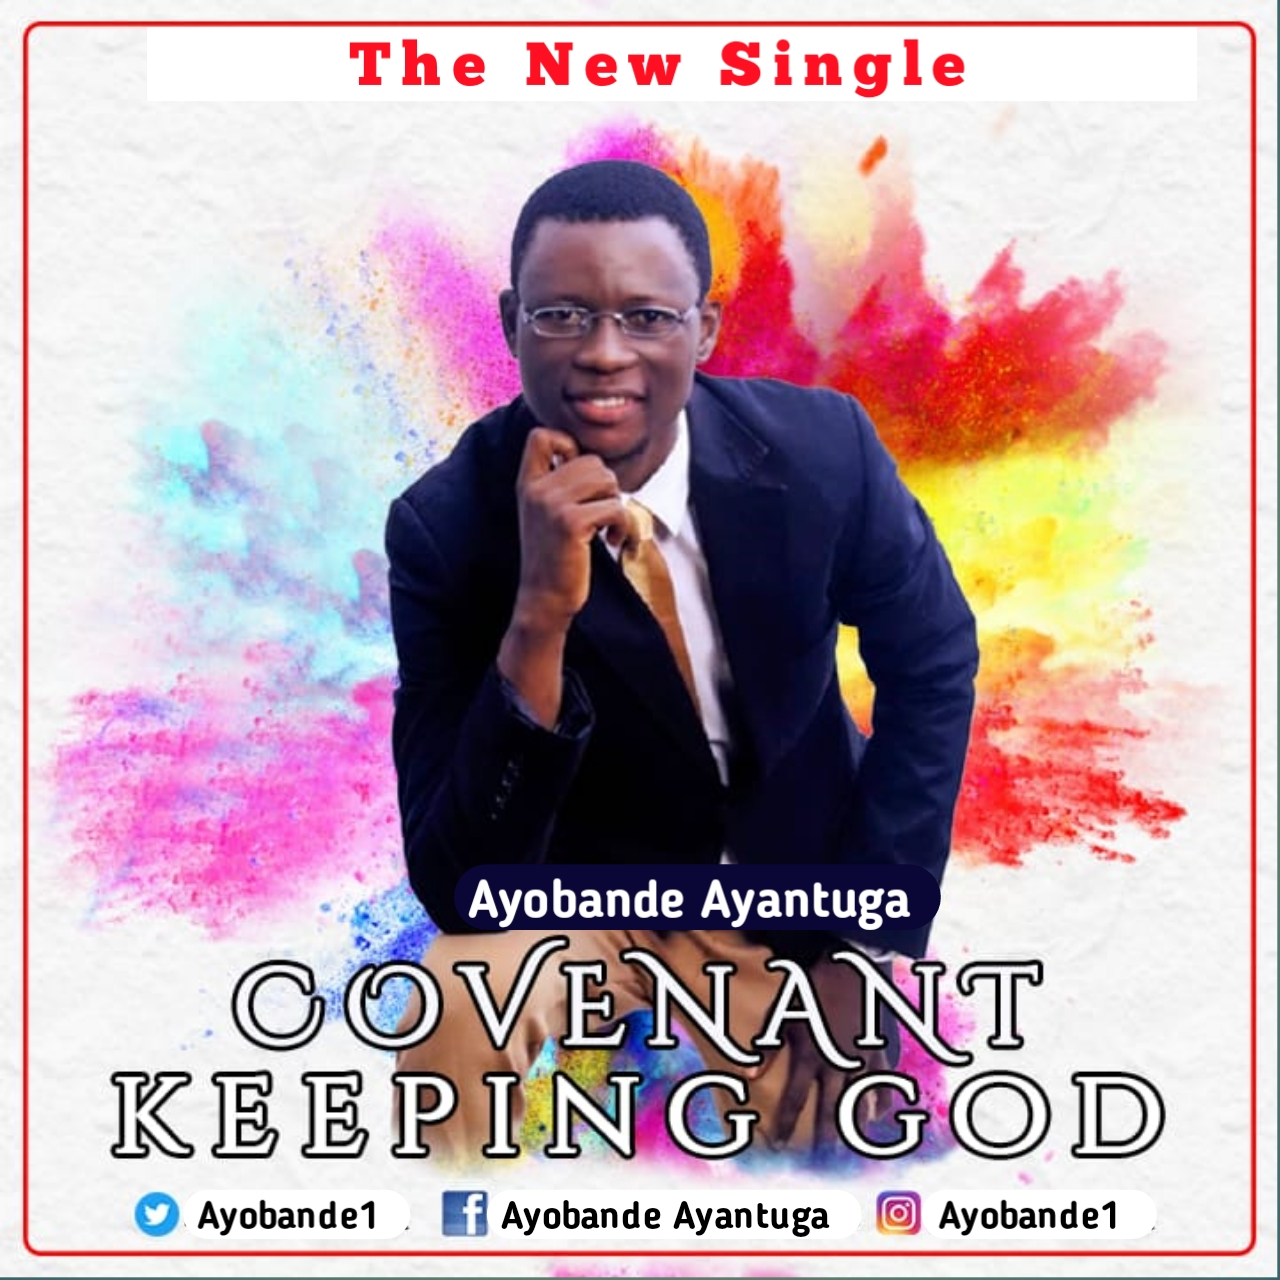 COVENANT KEEPING GOD - Ayobande Ayantuga